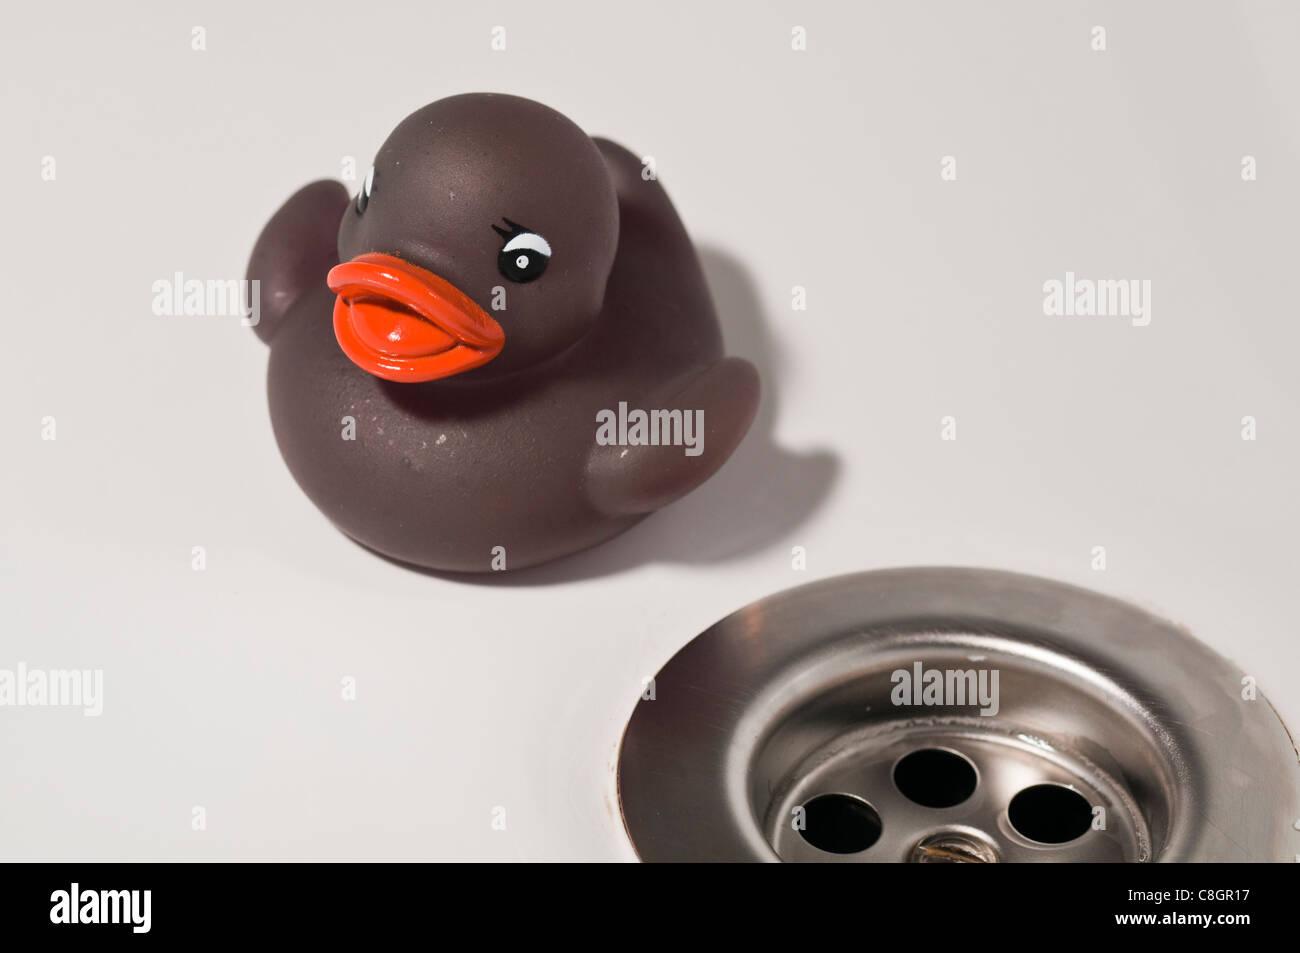 Rubber duck & plug hole - Stock Image